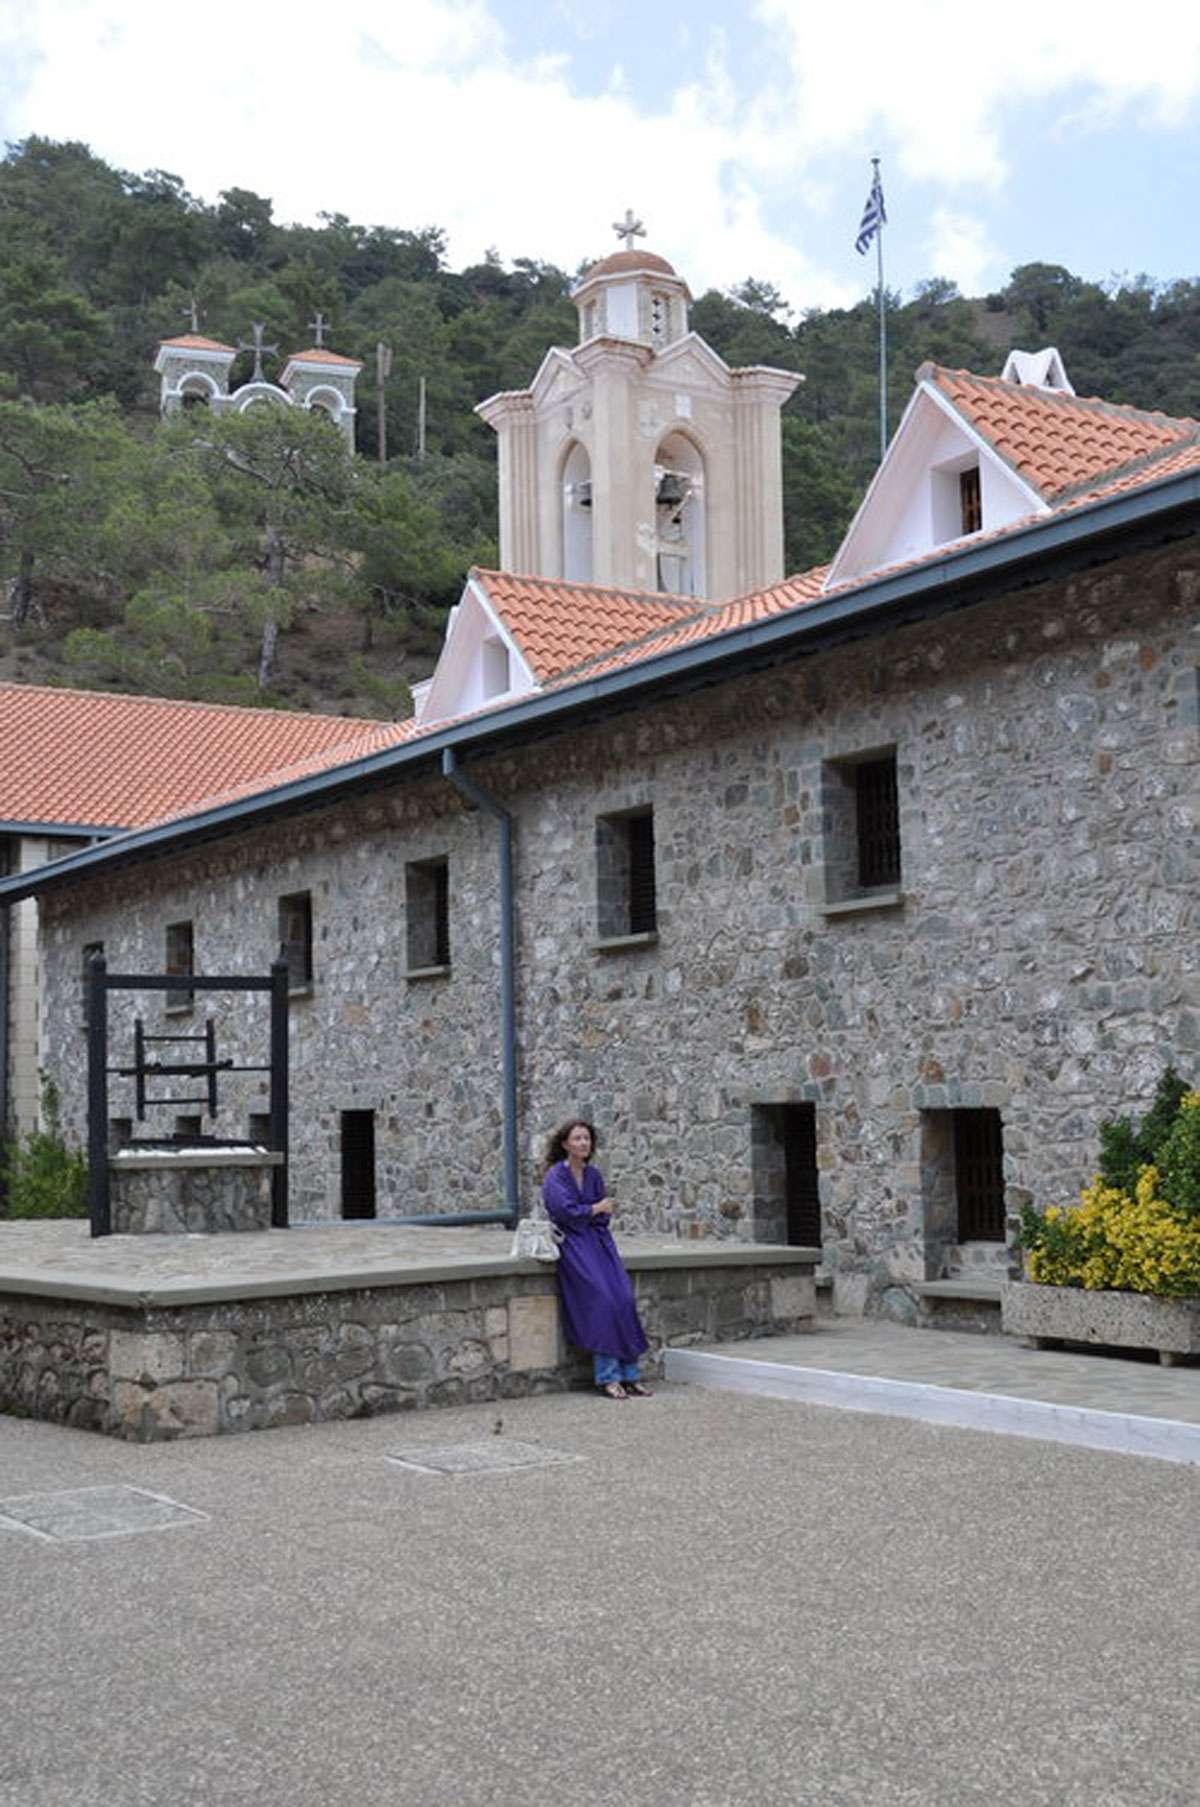 A pilgrim reflects at Kykkos Monastery